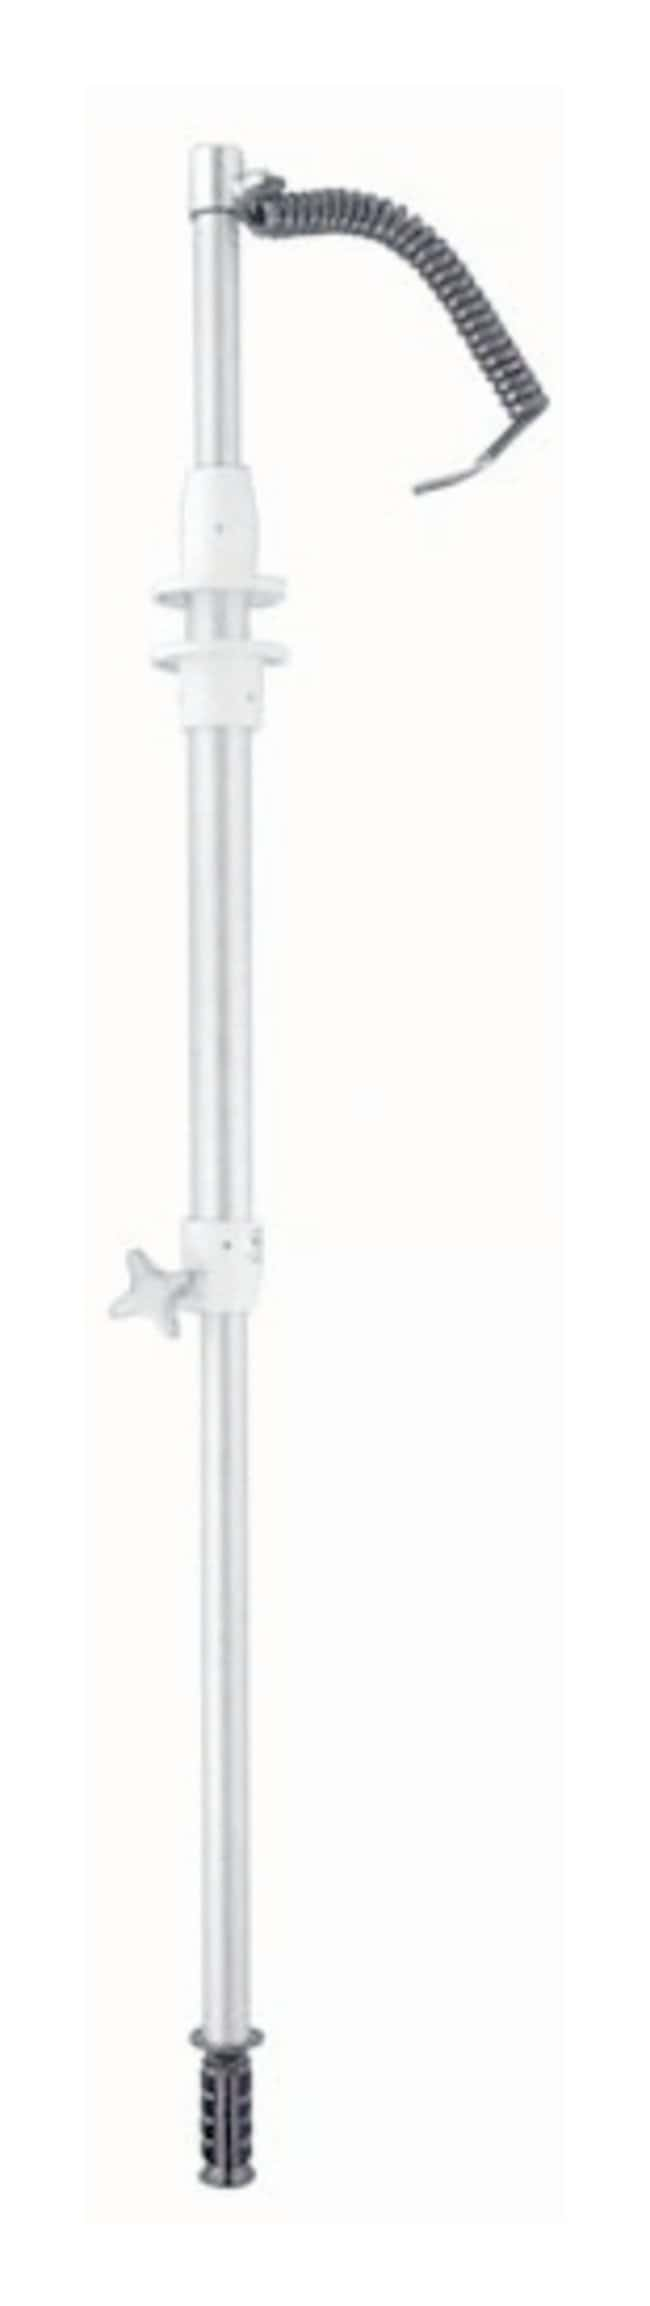 Tele-LiteTelescoping Aluminum Poles and Mounting Brackets:Emergency Response